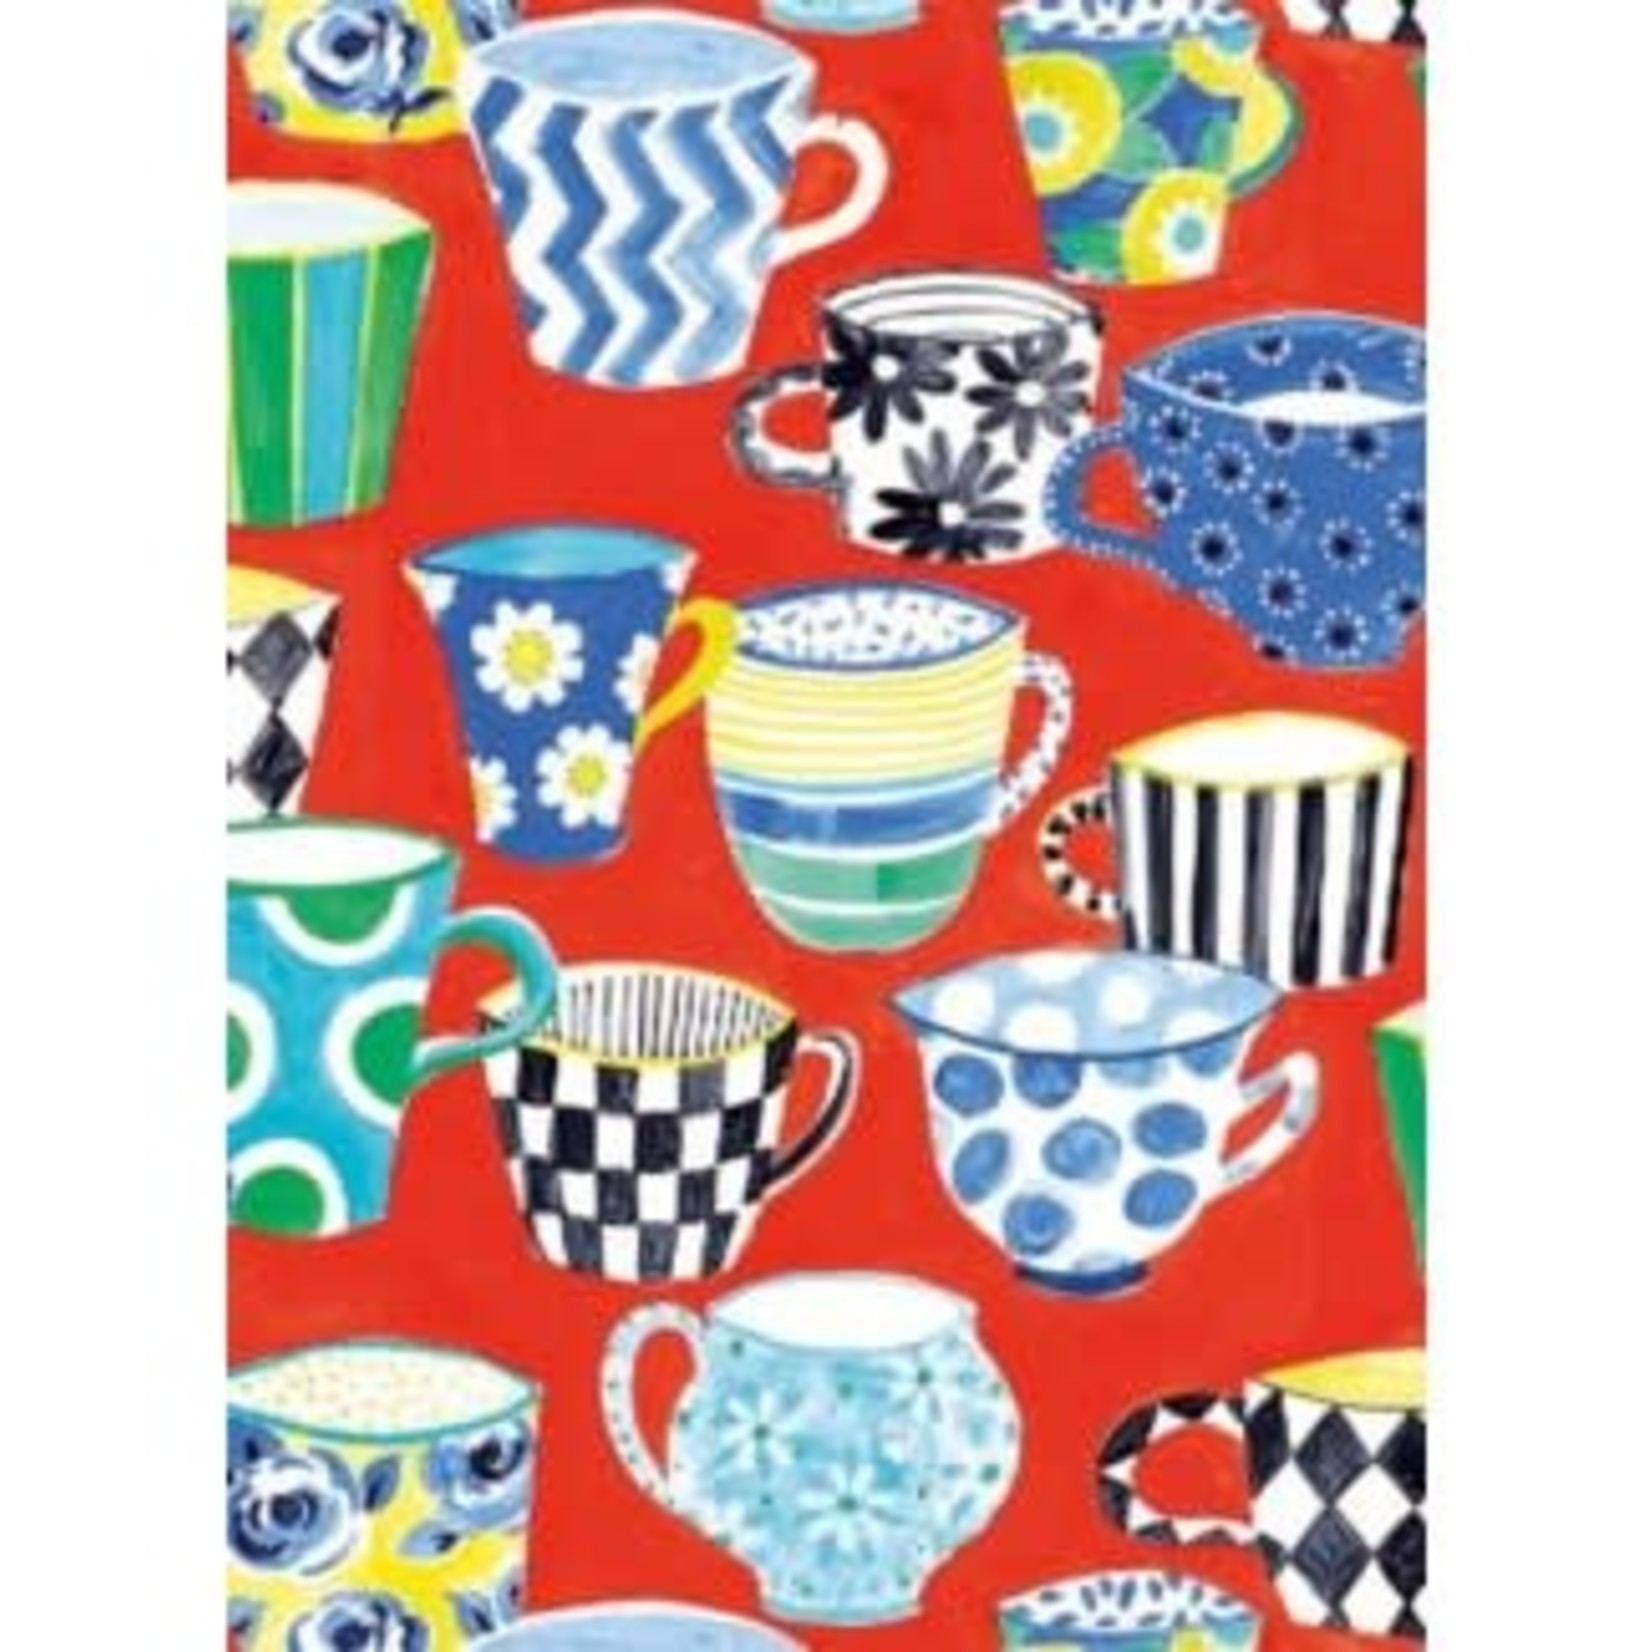 Museums and Galleries Coffee Break